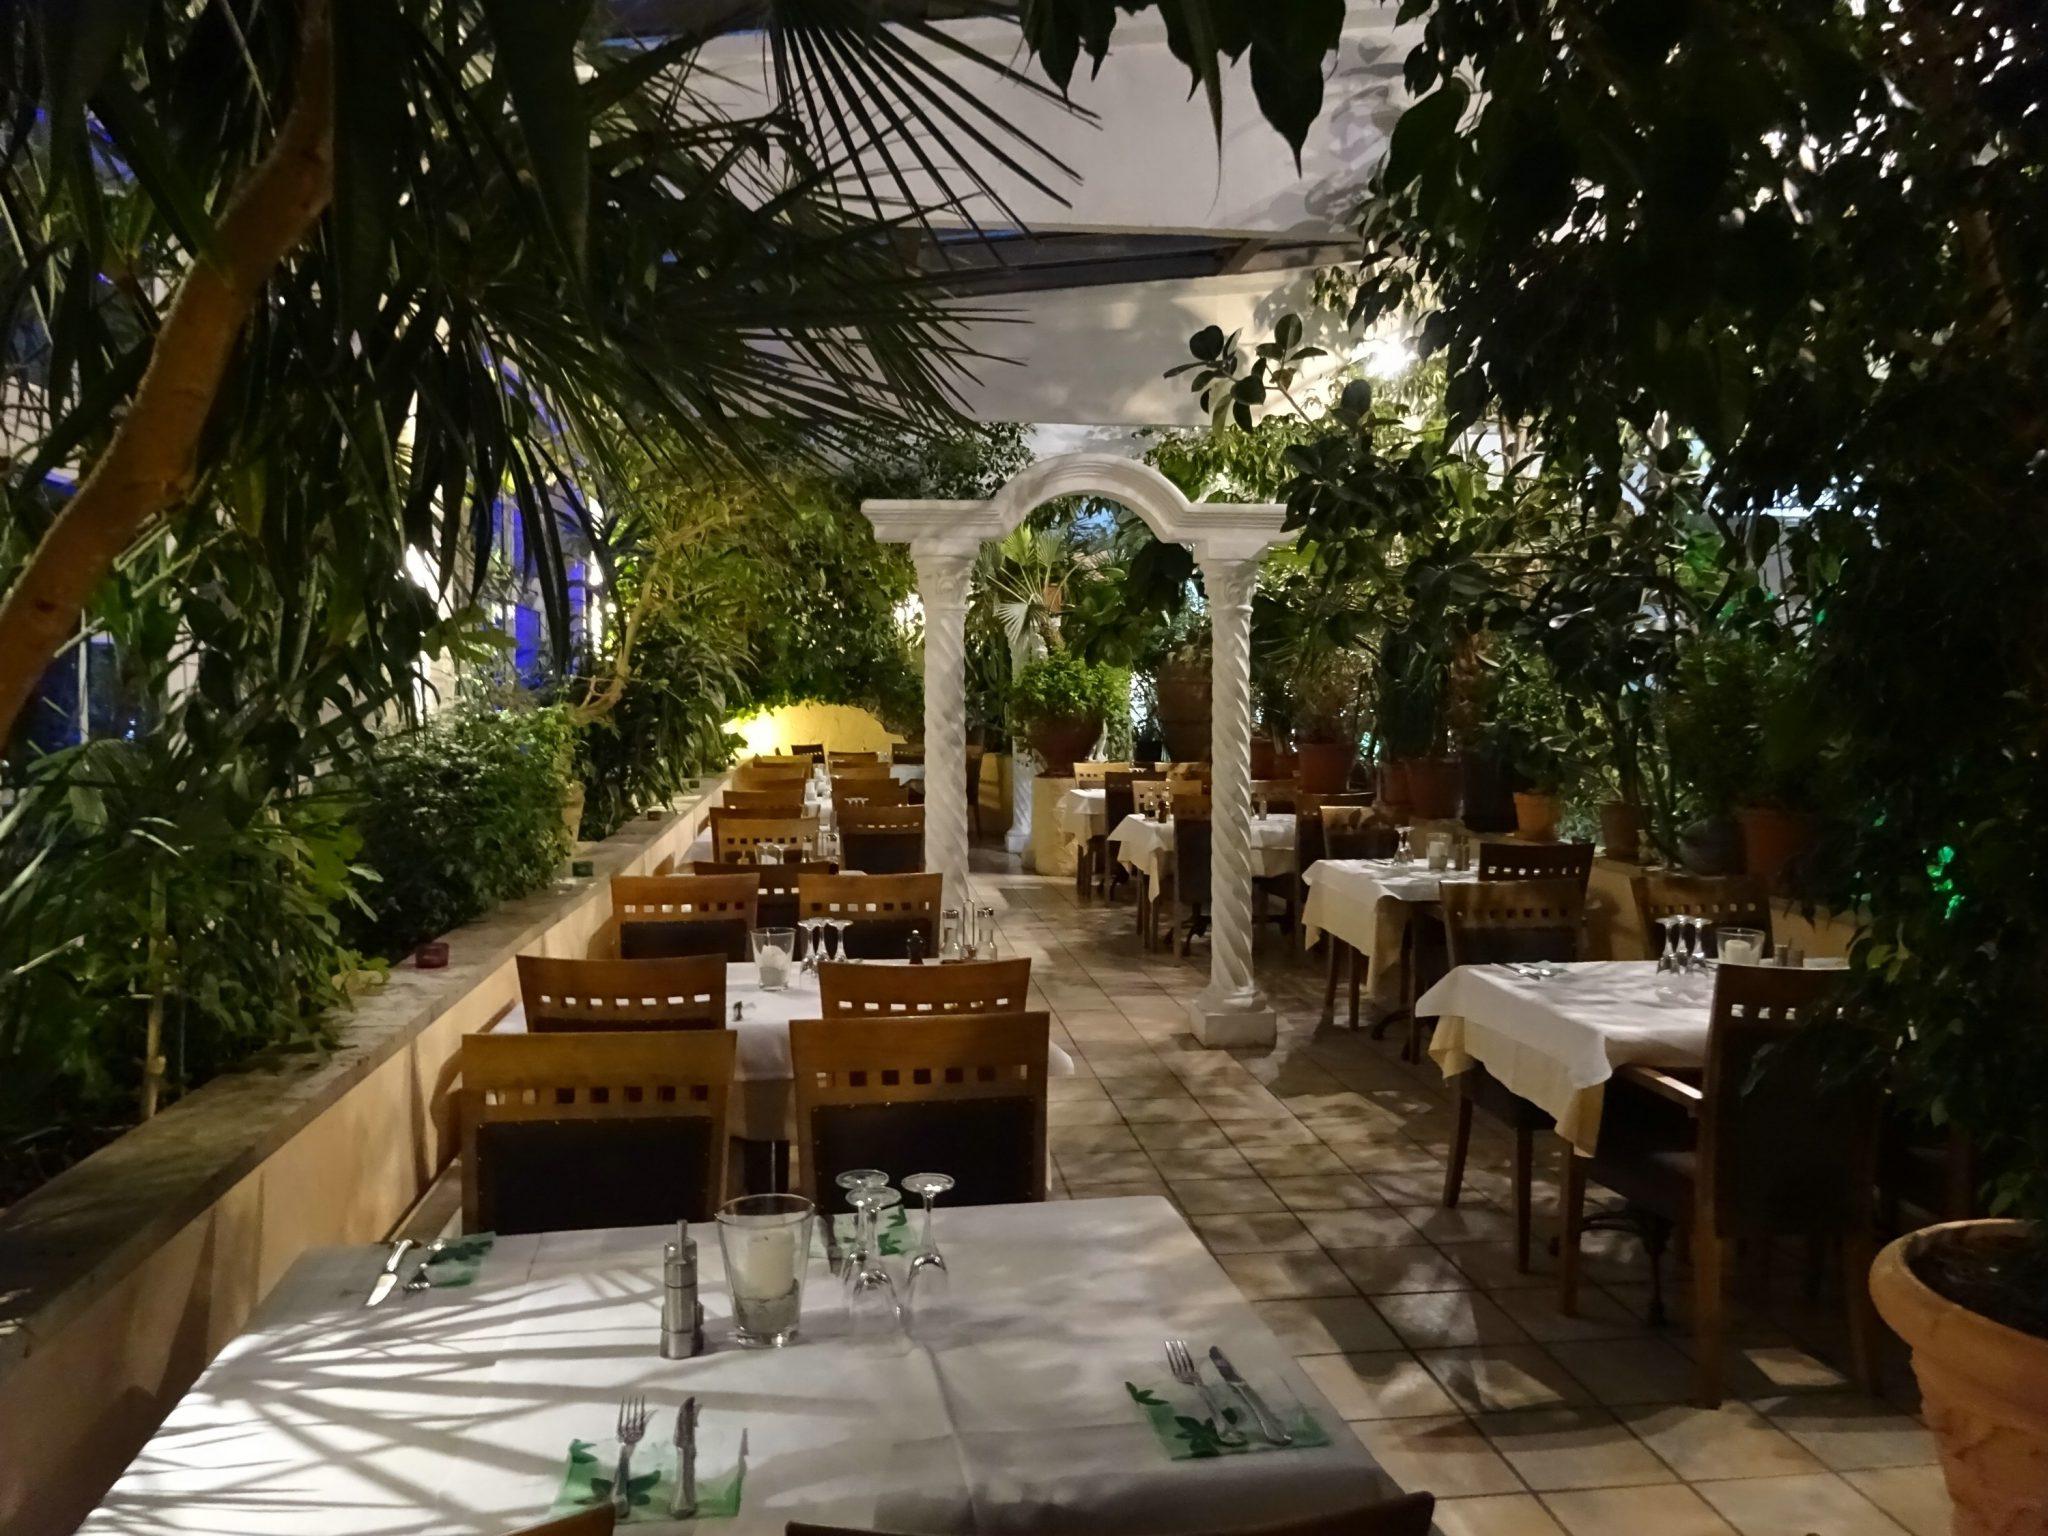 Restaurant in Alzenau